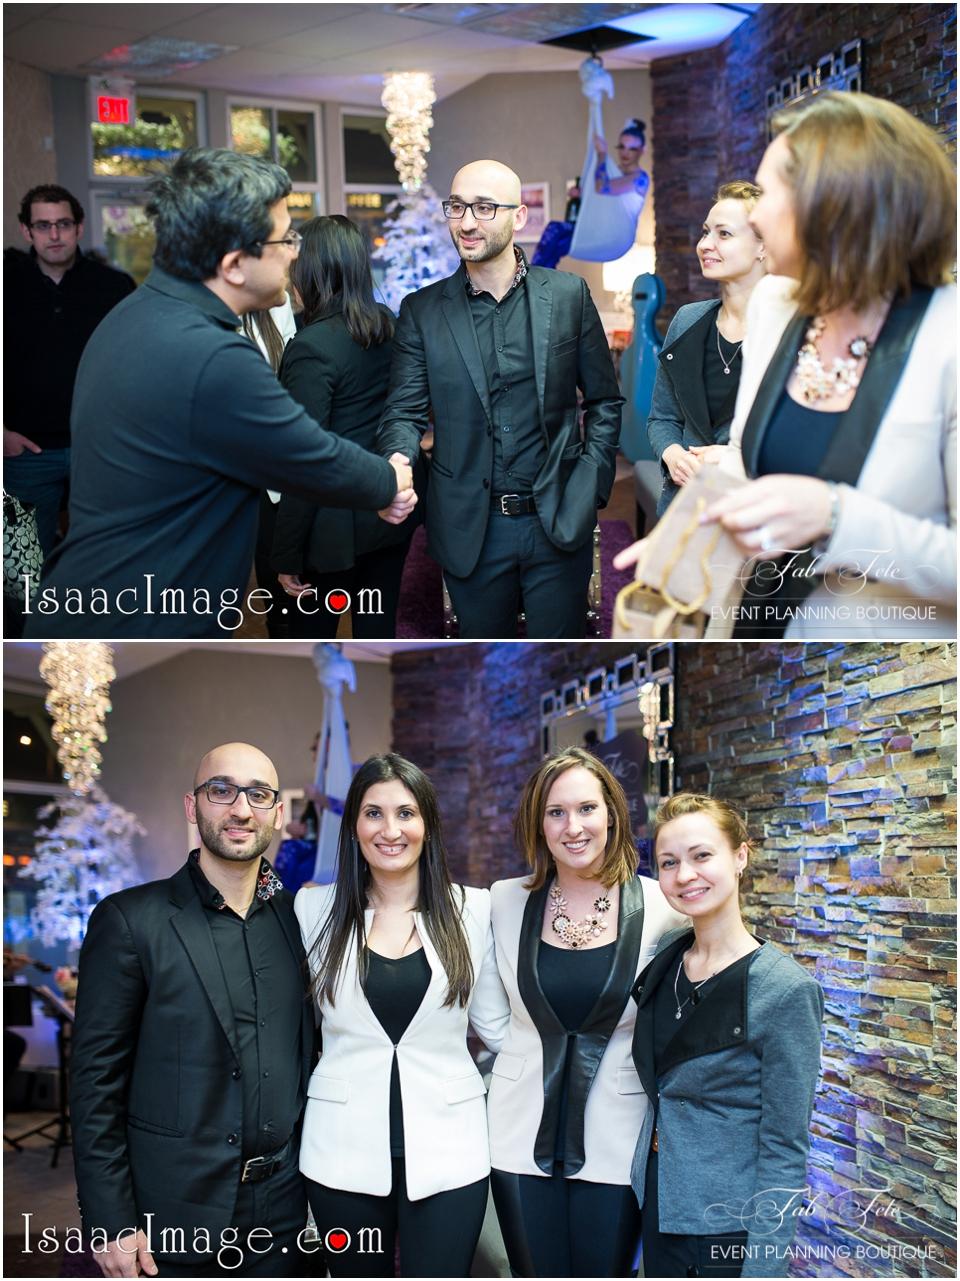 Fab Fete Toronto Wedding Event Planning Boutique open house_6499.jpg